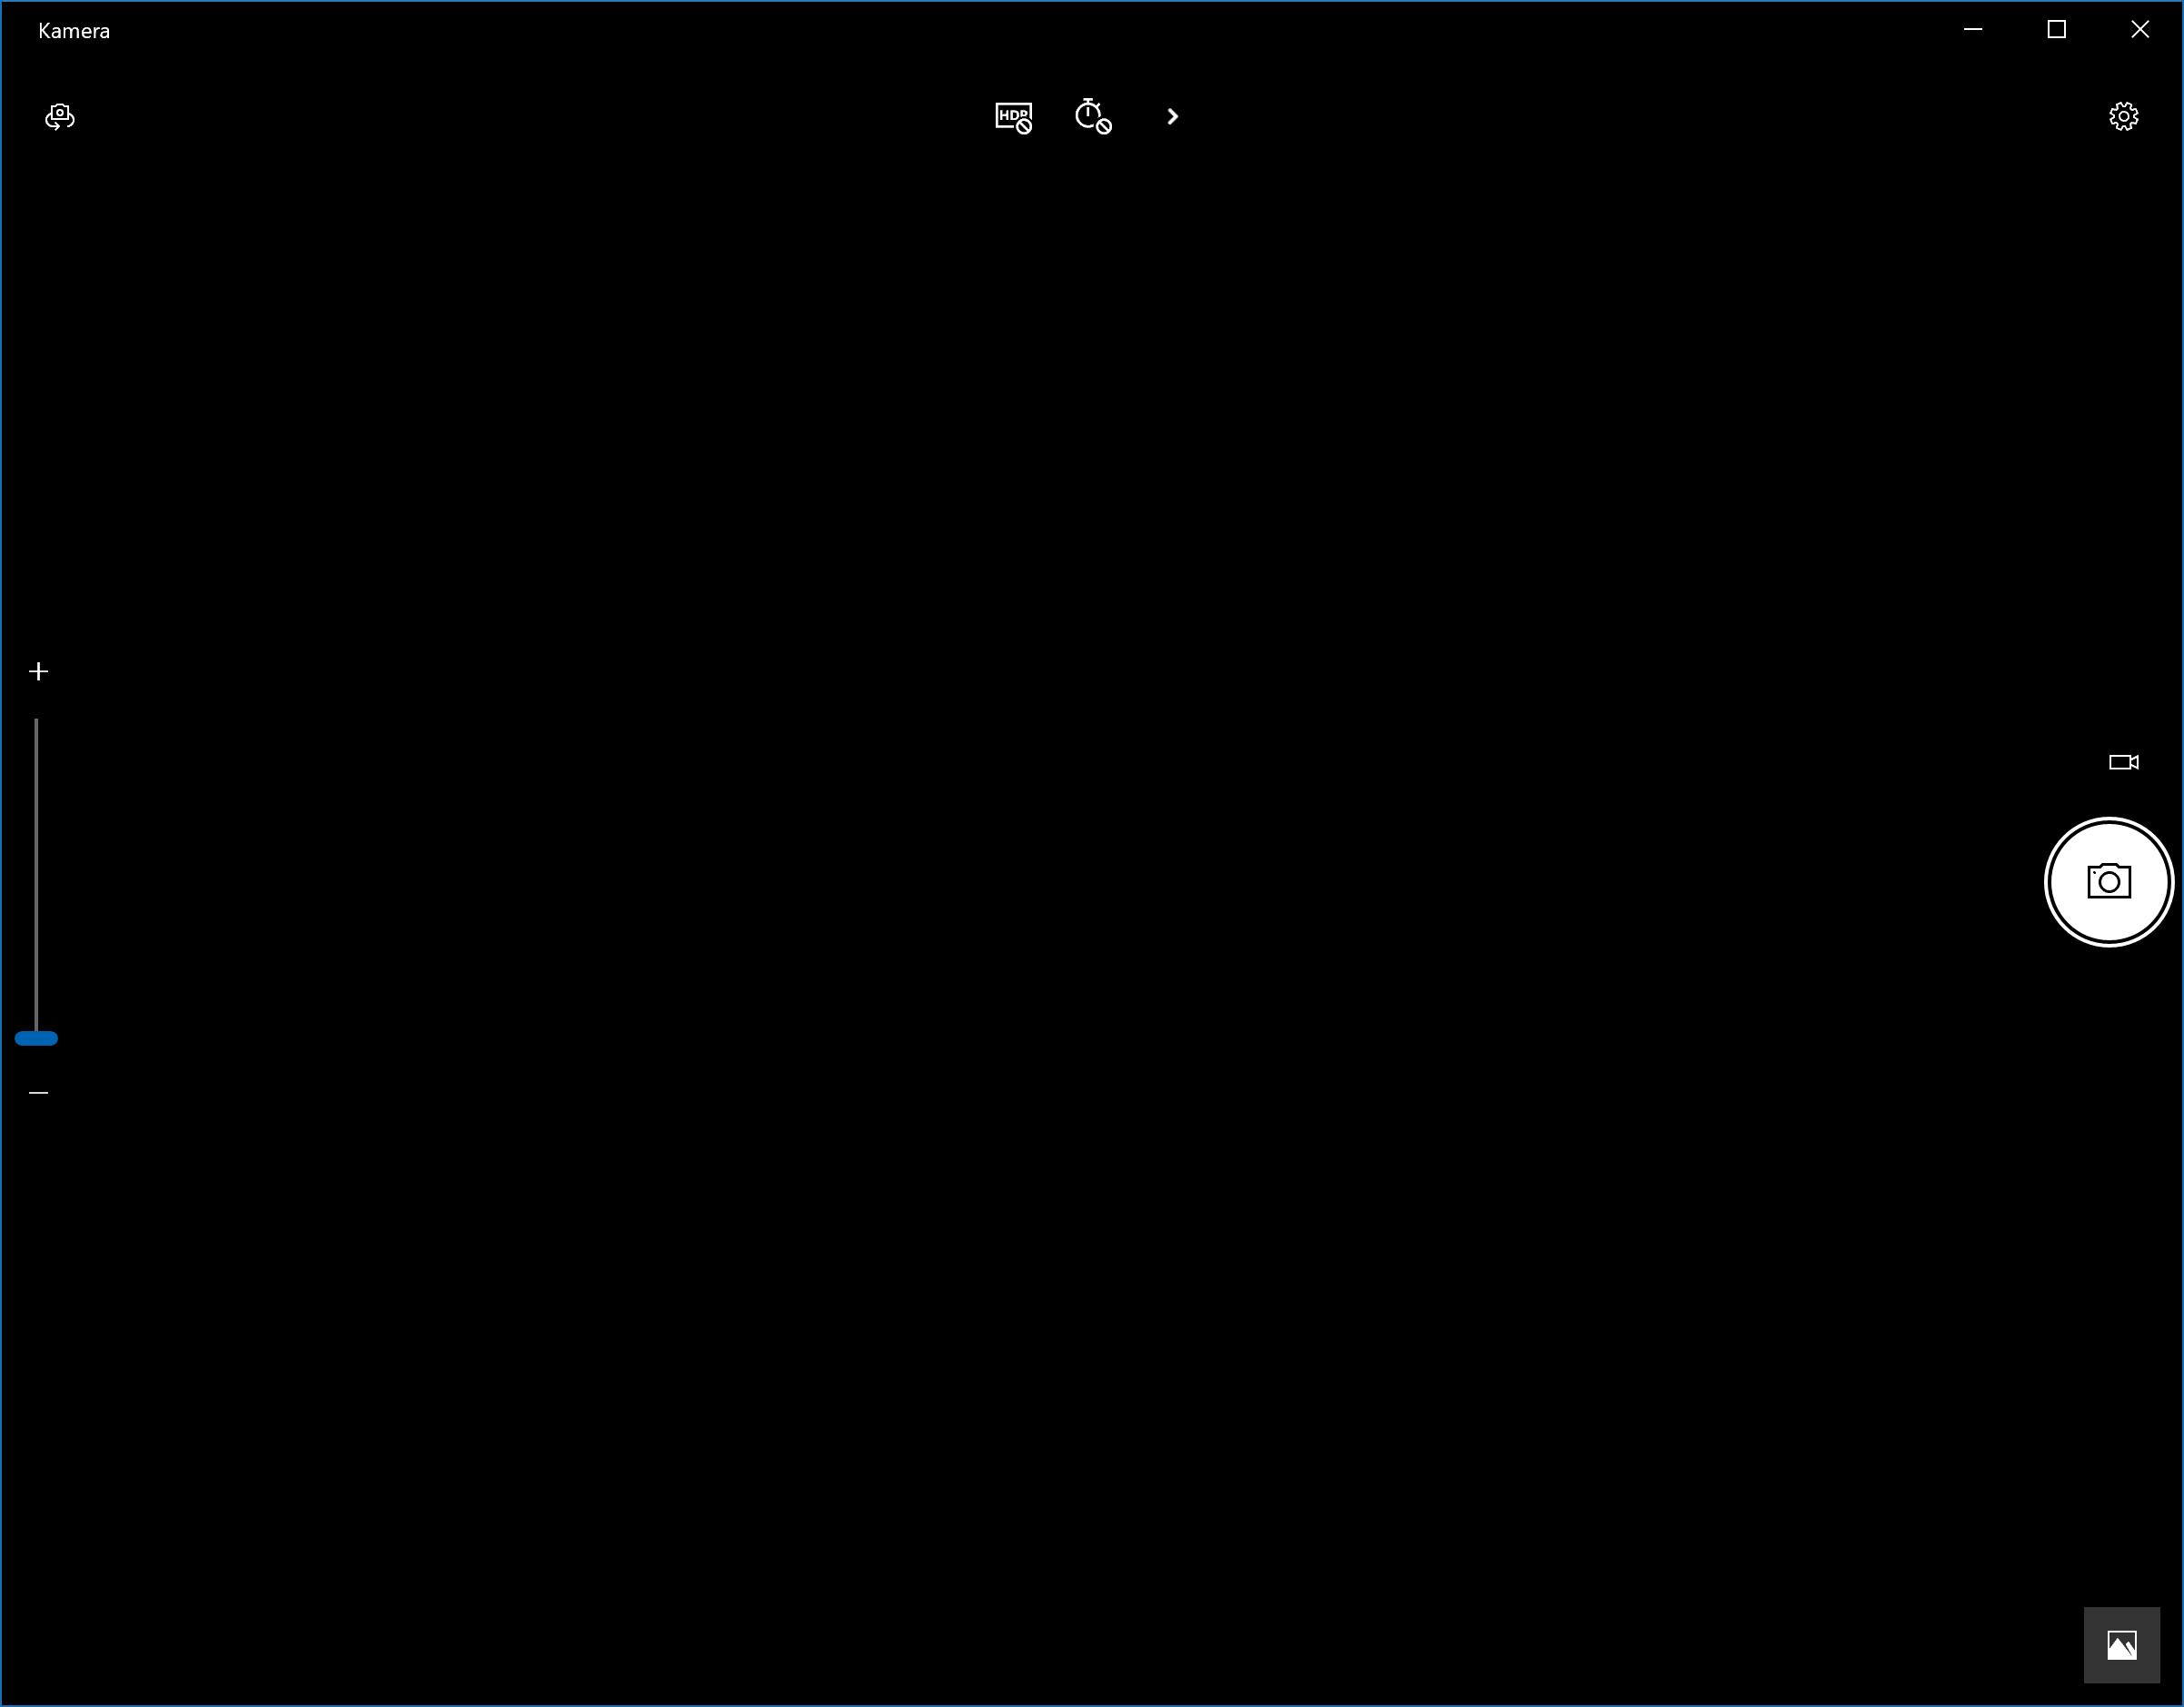 Surface Book 2 - Kamera funktioniert nicht